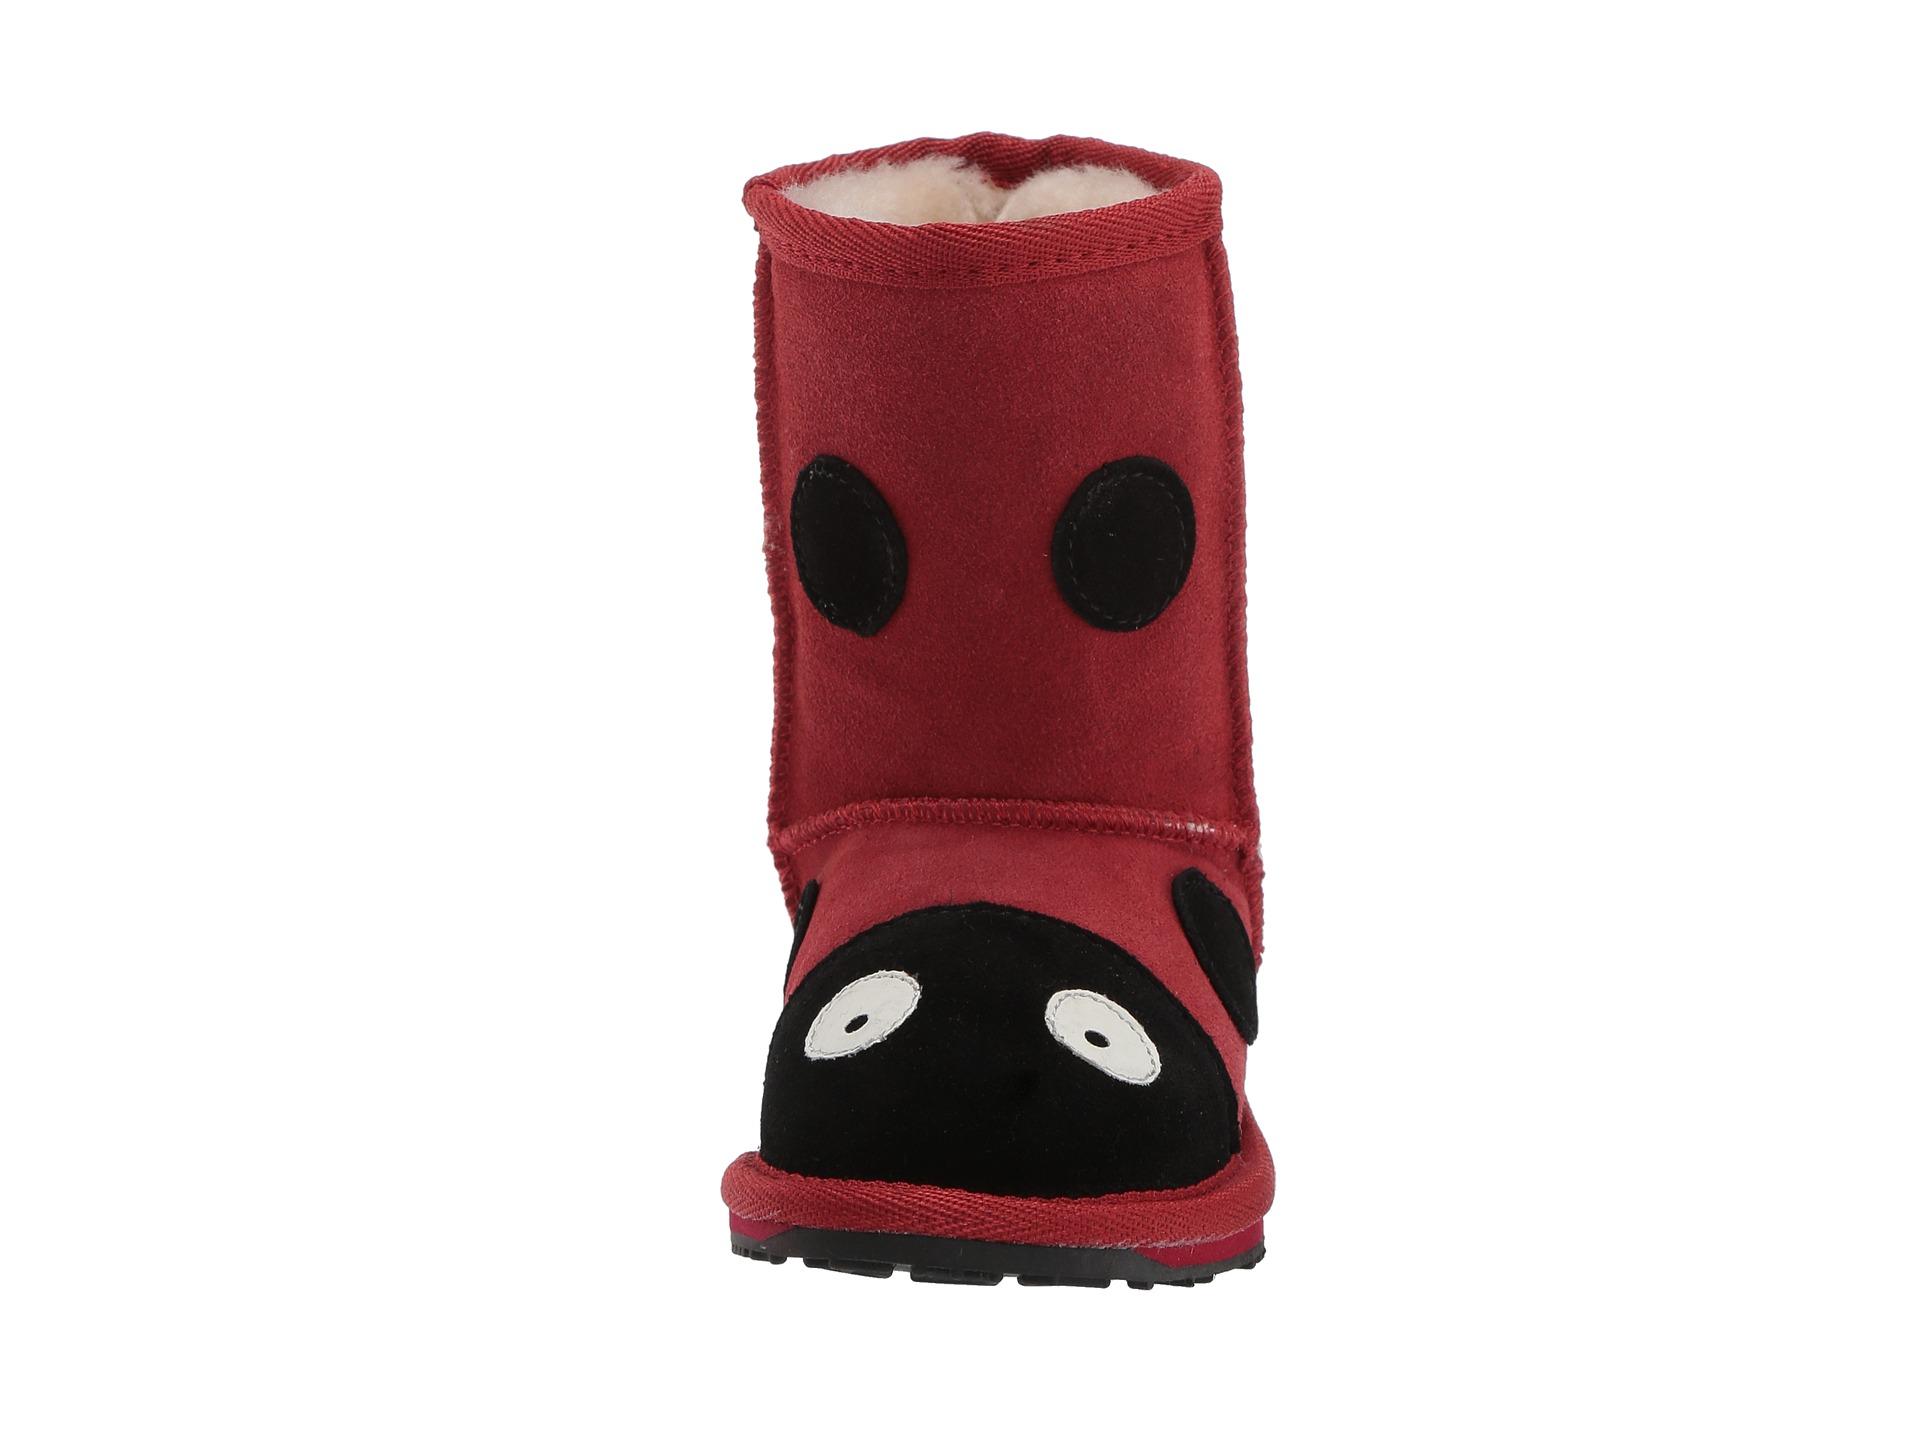 fa77575f865 Ugg Ladybug Boots